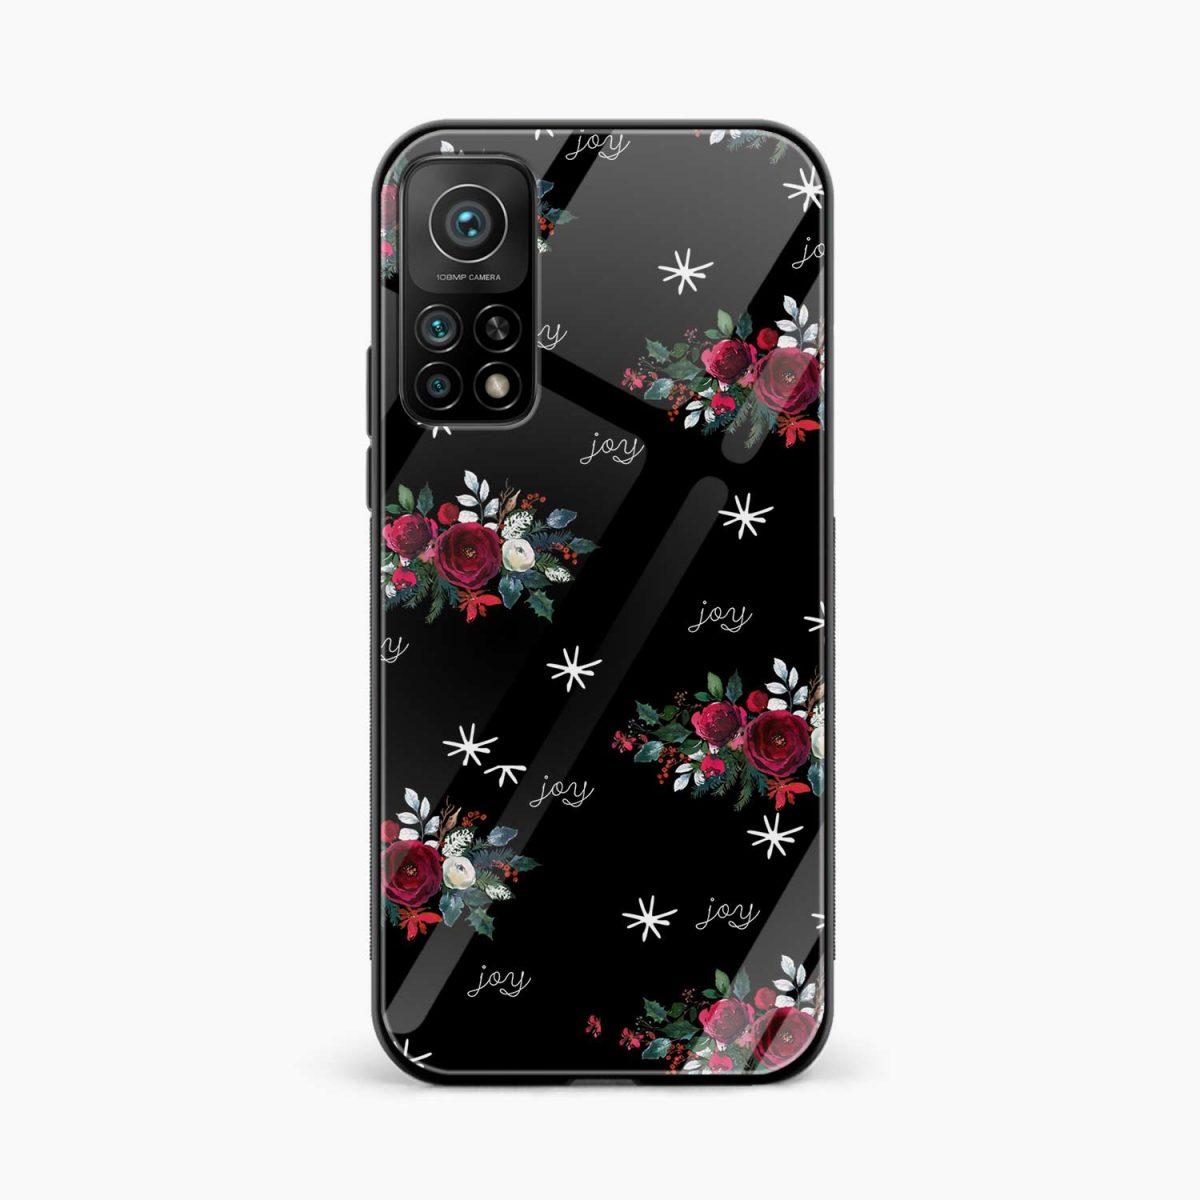 joy floral black colored xiaomi mi 10t pro back cover front view